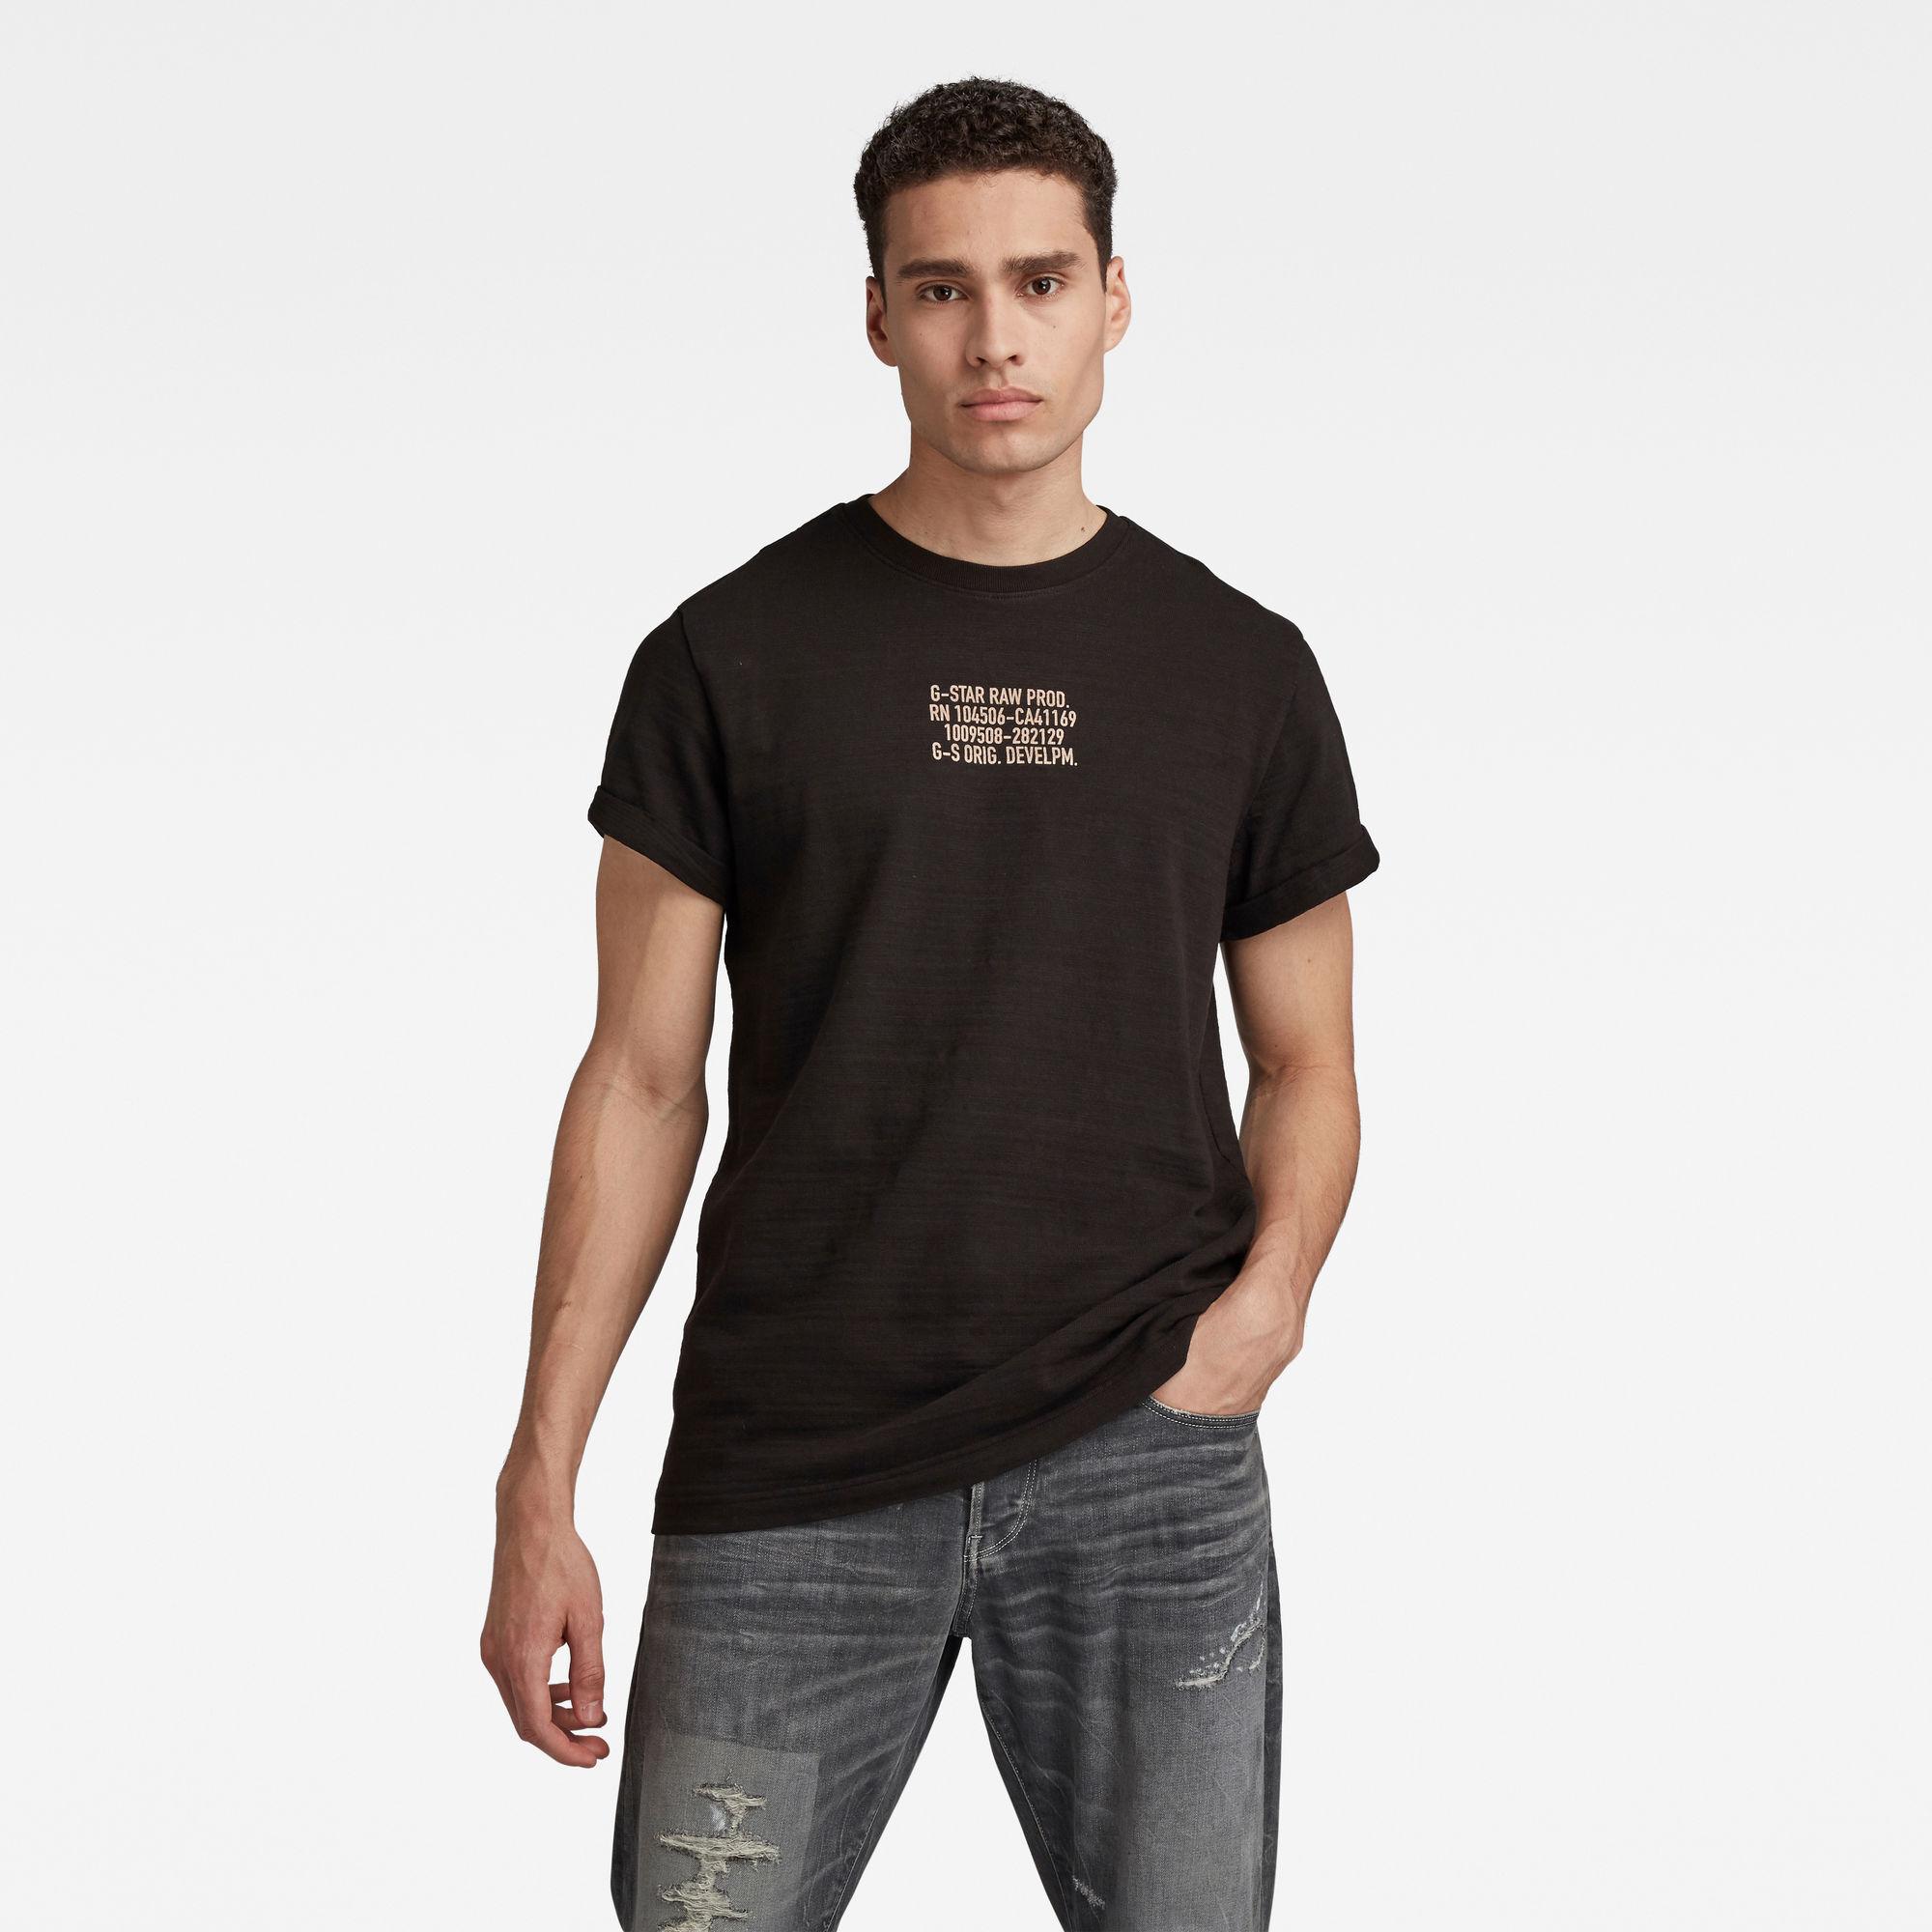 G-star RAW Hommes T-shirt Chest Text Graphic Lash Noir  - Taille: XL L XXS XXL XS S M